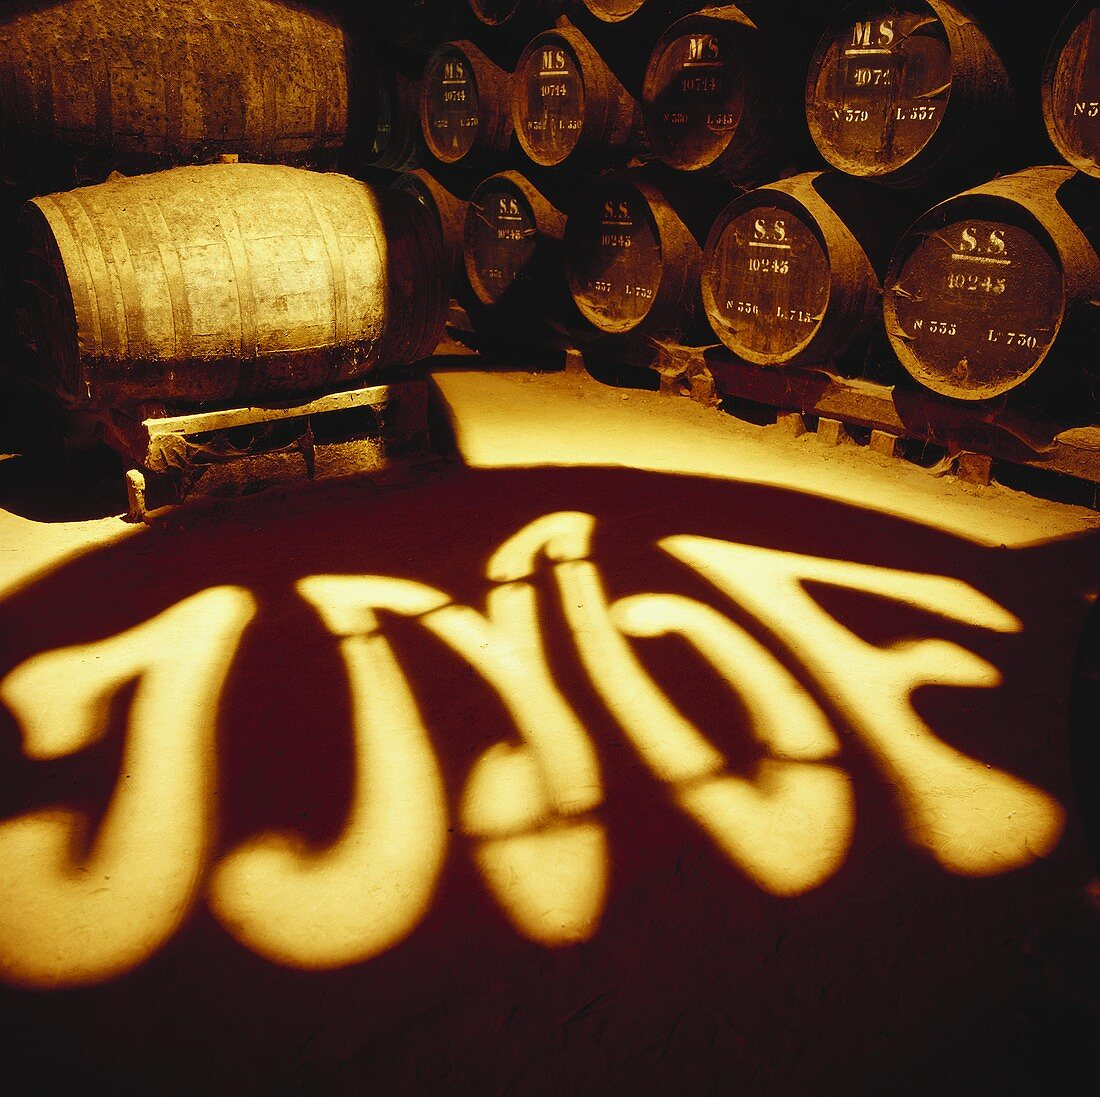 View into wine cellar of Jose-Maria da Fonseca, Azeitao, Portugal